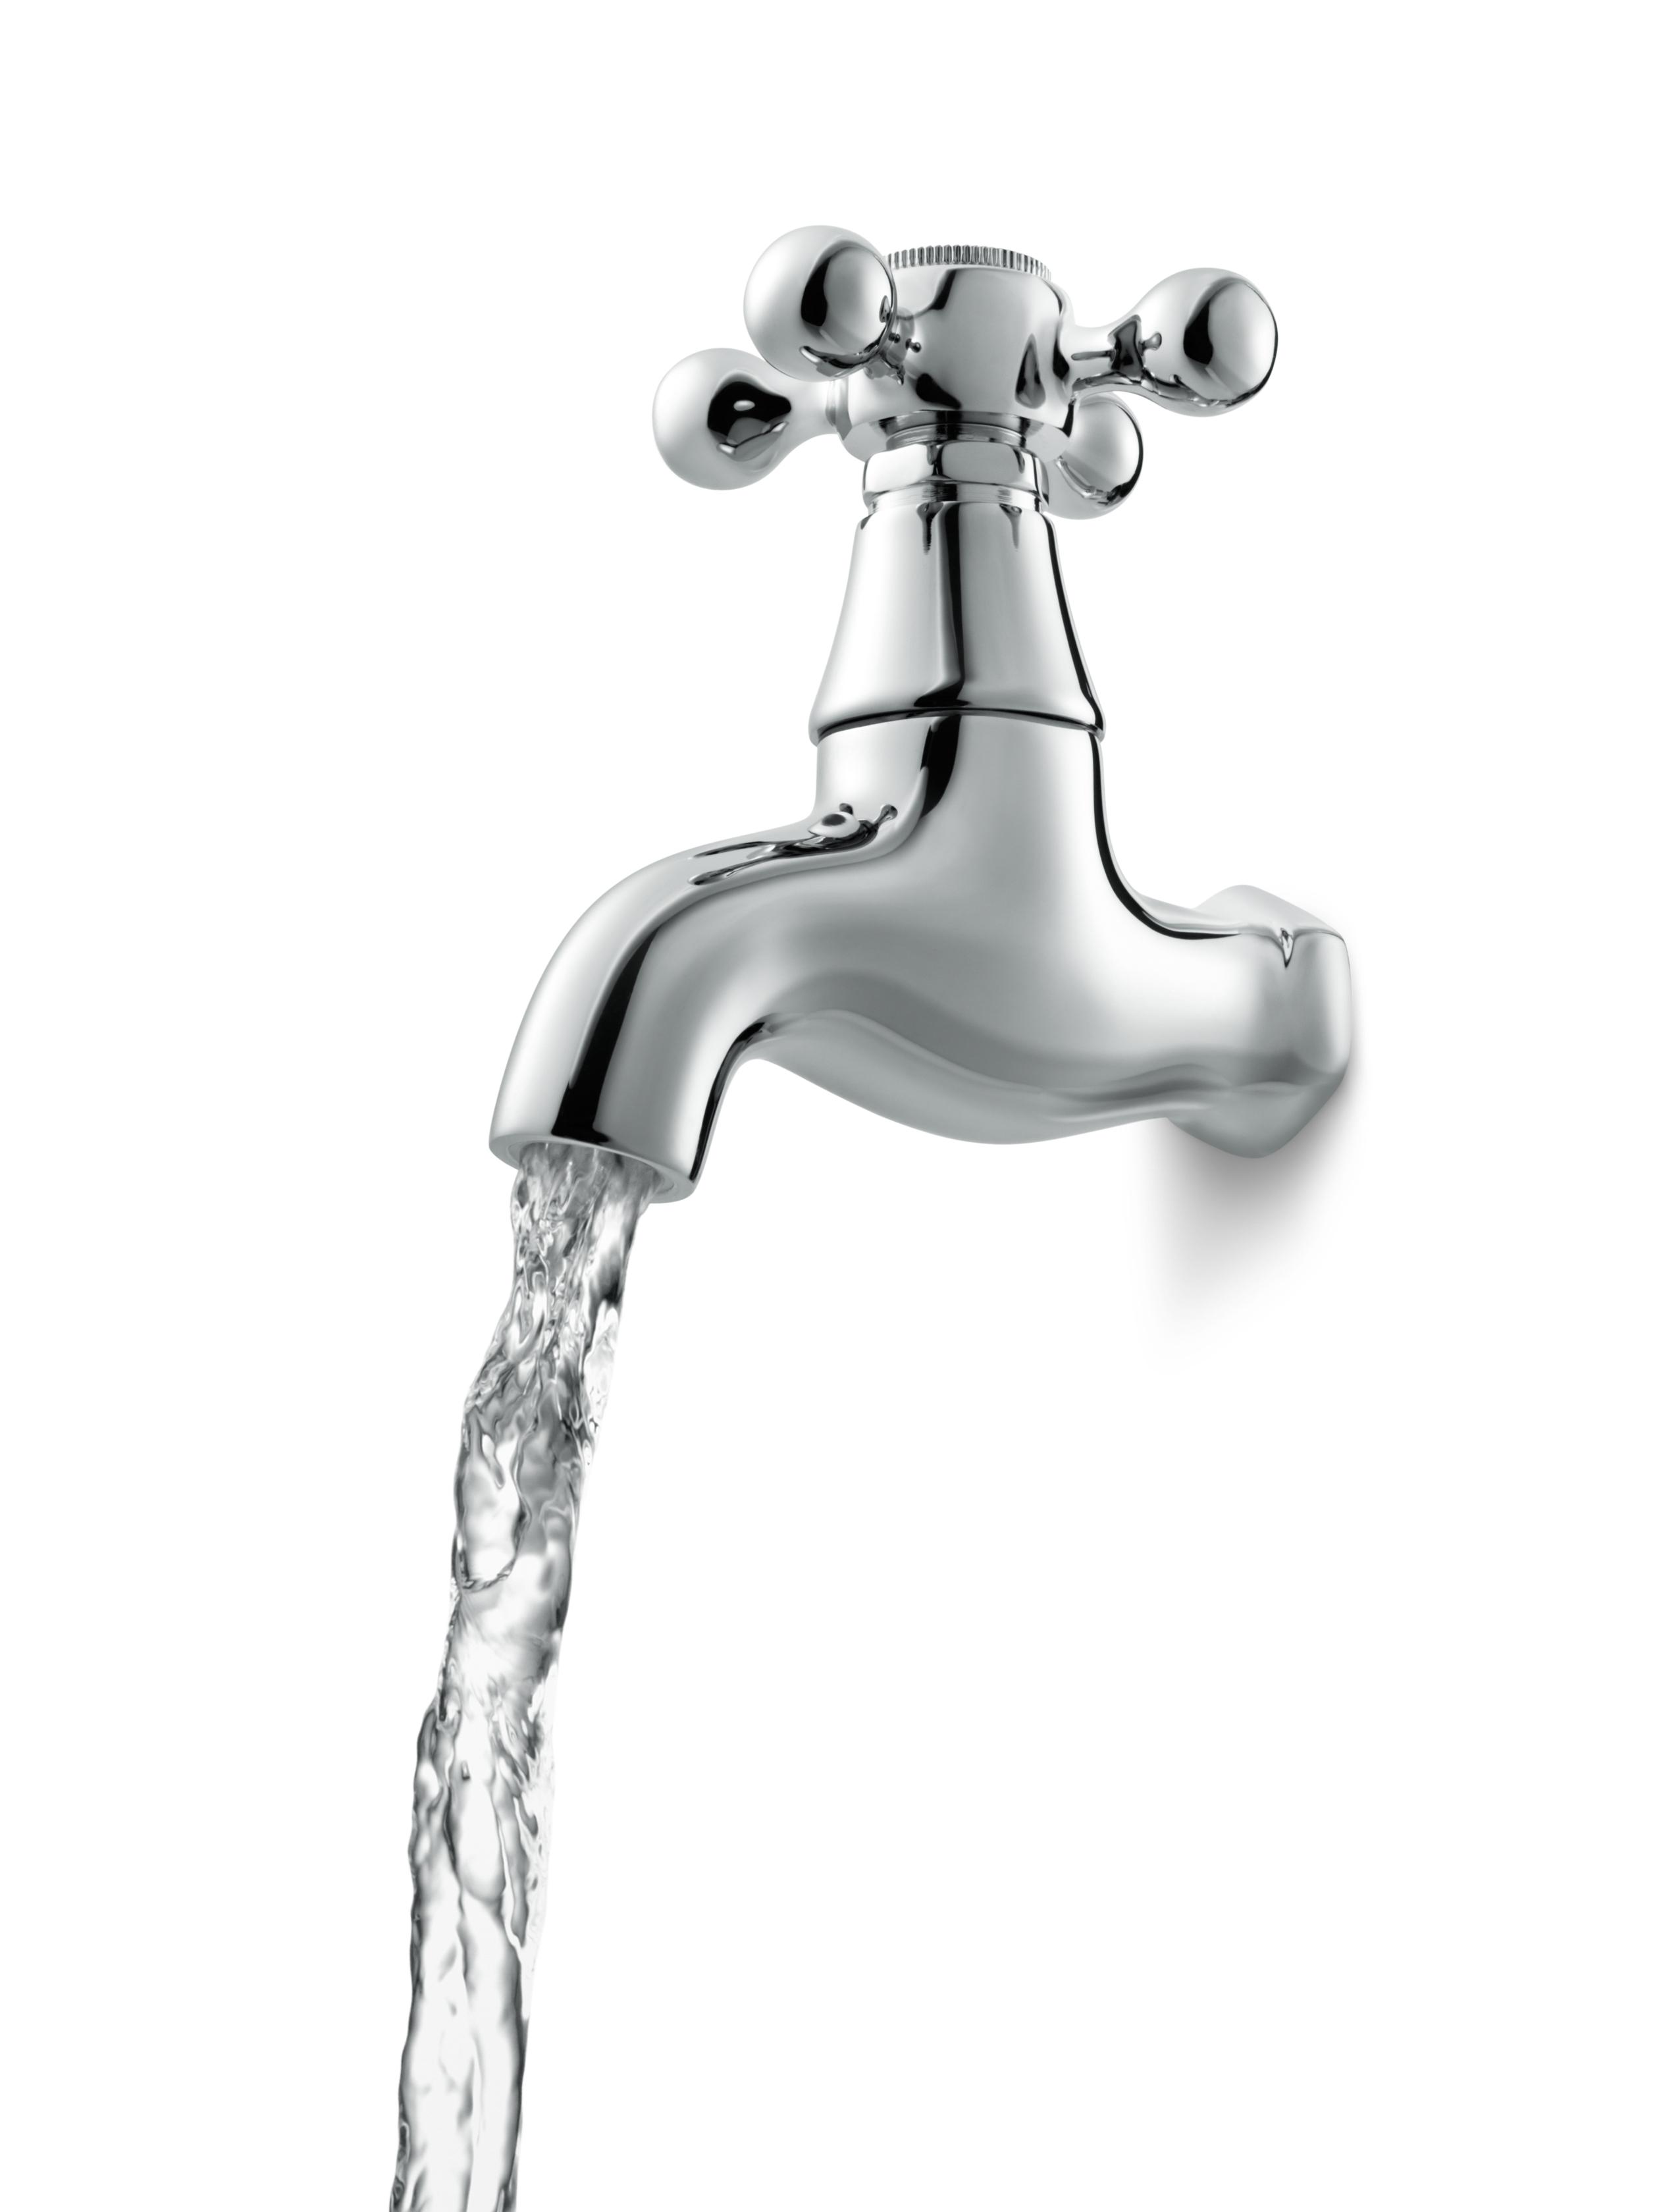 Water Faucet PNG - 151046